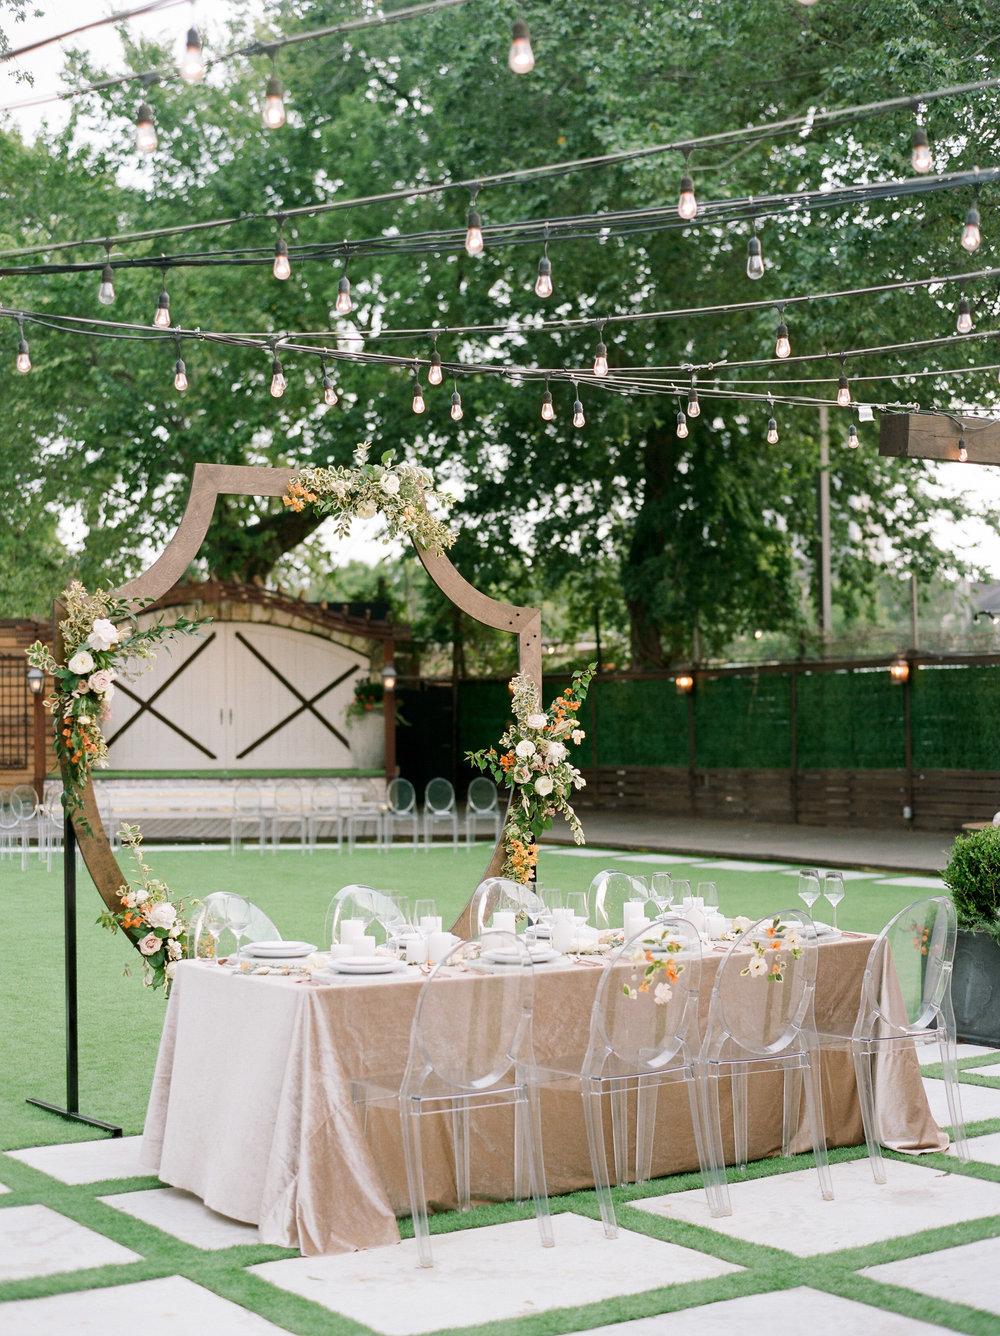 Houston-Wedding-Photographer-Fine-Art-Film-Destination-Style-Me-Pretty-Austin-Dallas-New-Orleans-Dana-Fernandez-Photography-11.jpg